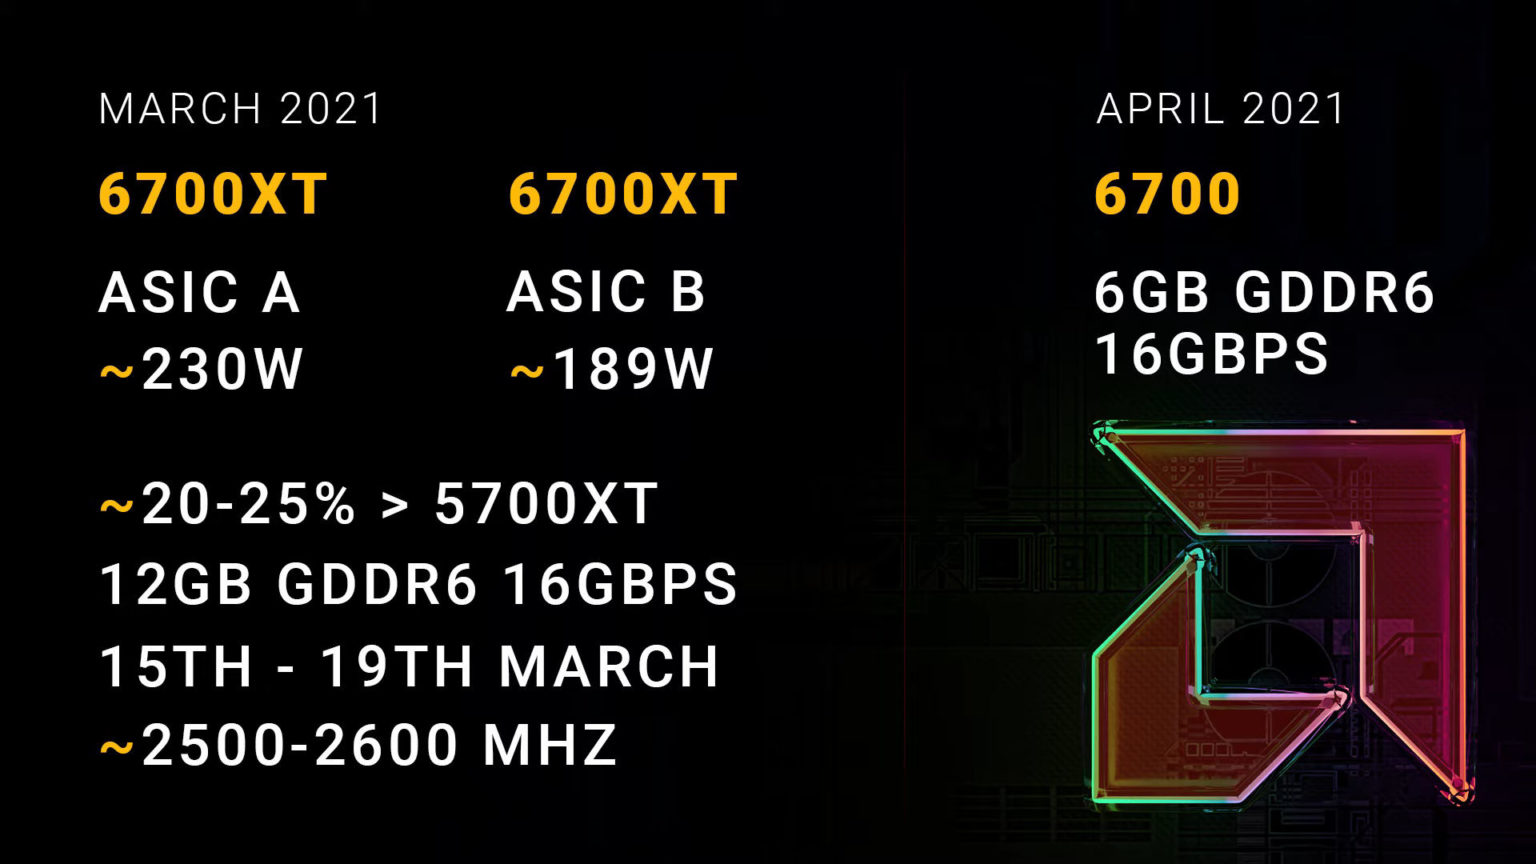 AMD-Radeon-RX-6700-XT-ASIC-A-vs-B.jpg